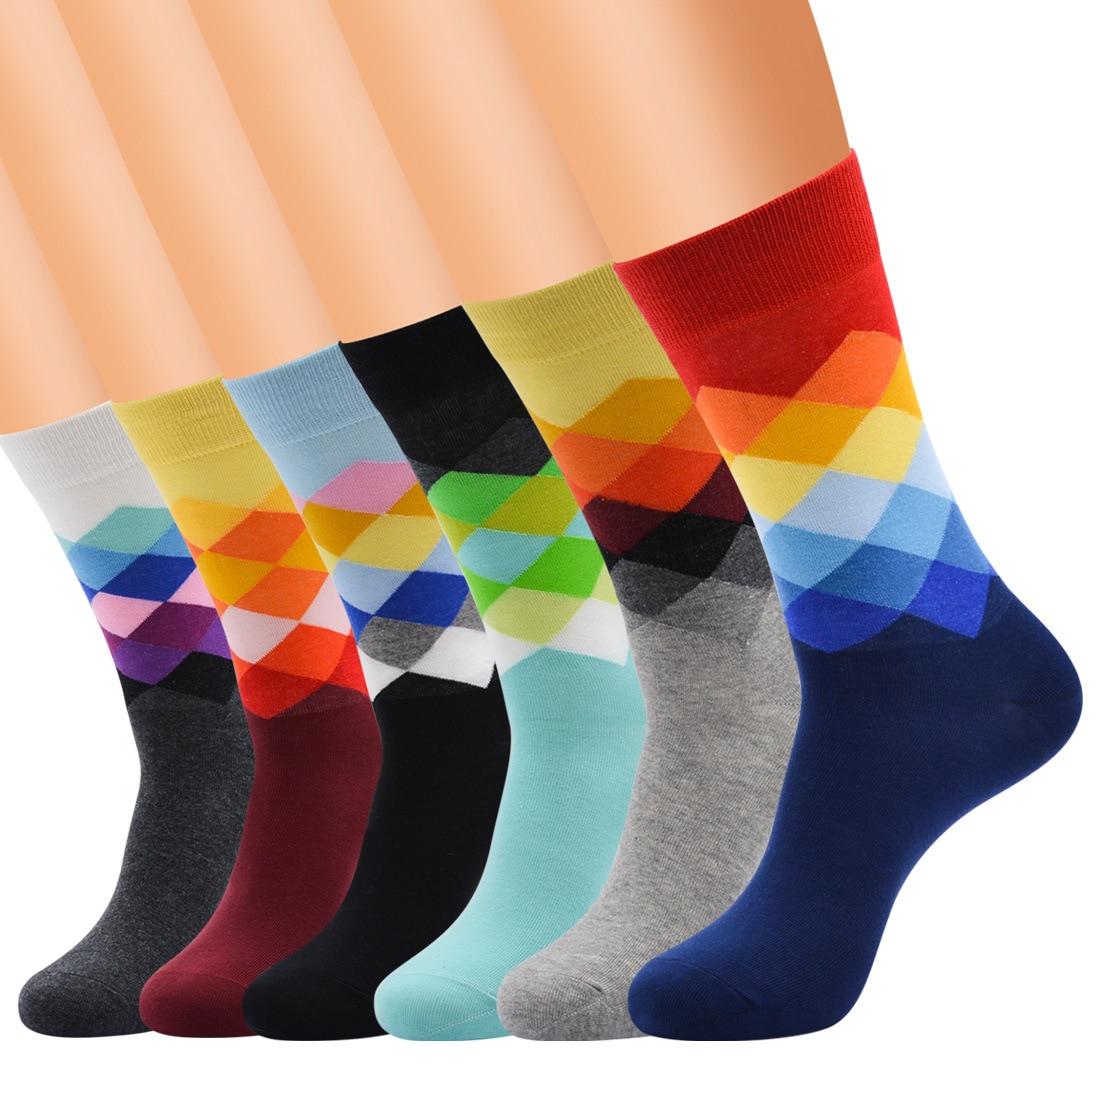 Middle Tube Combed Cotton 4 Season Wearing Premium Quality Diamond Pattern Rainbow Color Women Fashion Socks